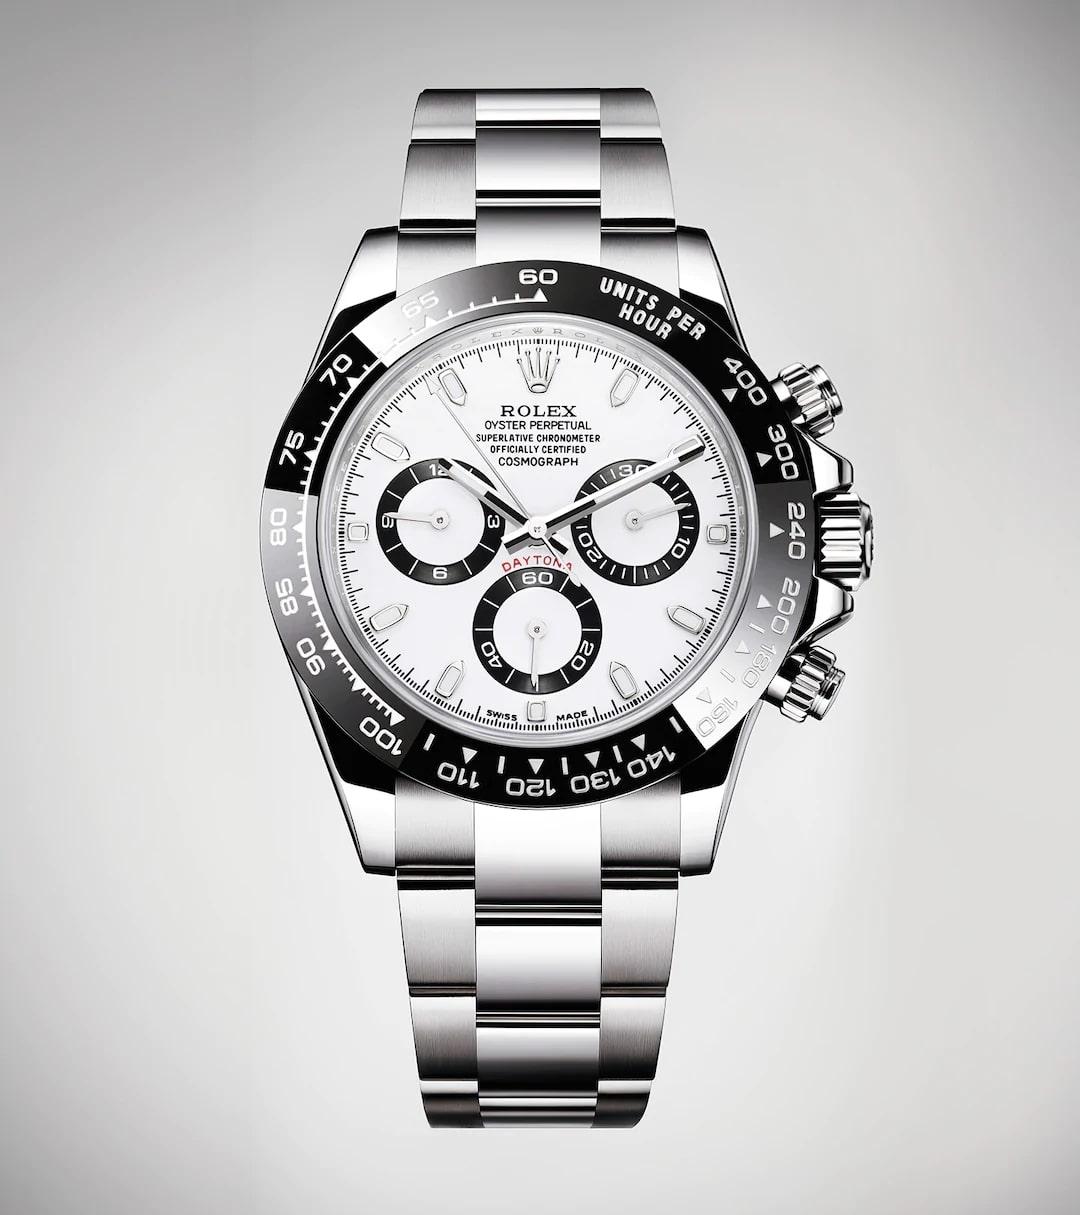 rolex-daytona-chronograph-watch.jpg